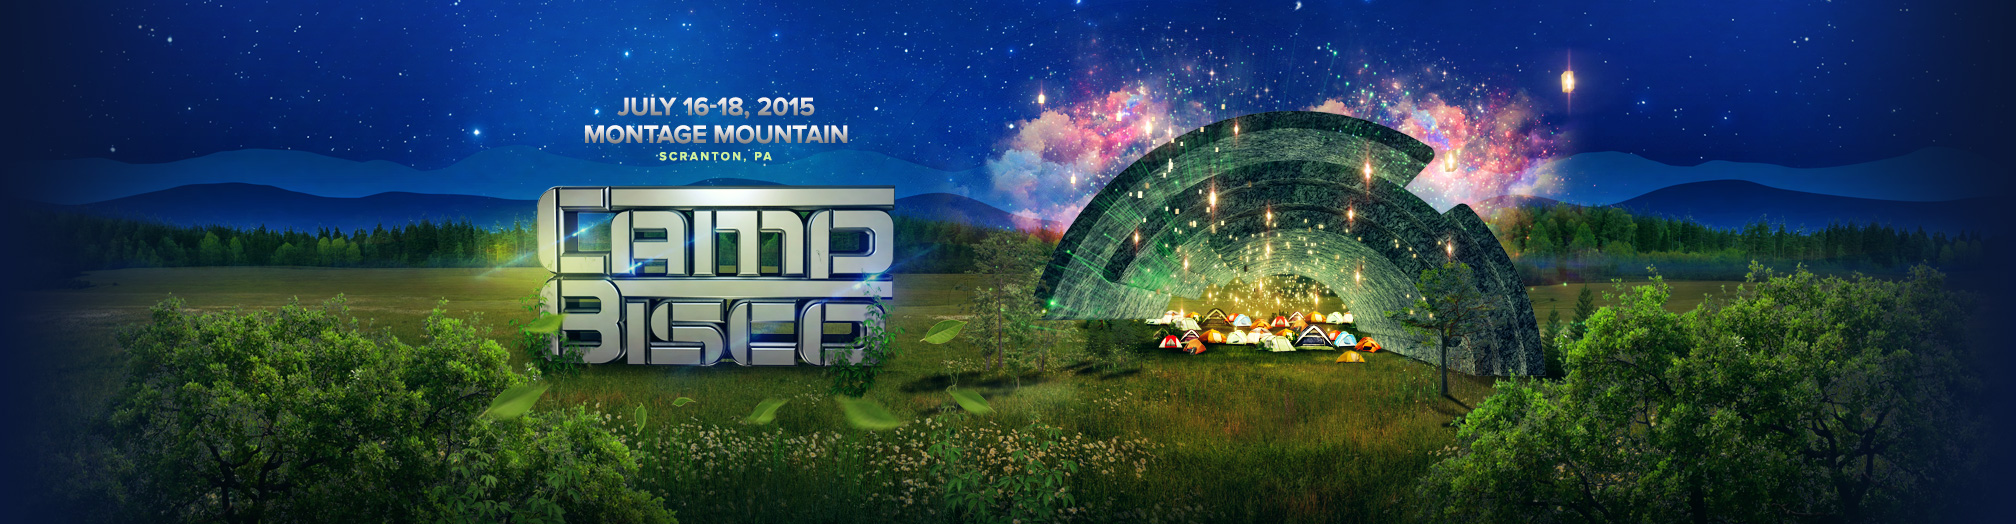 Camp Bisco 2015